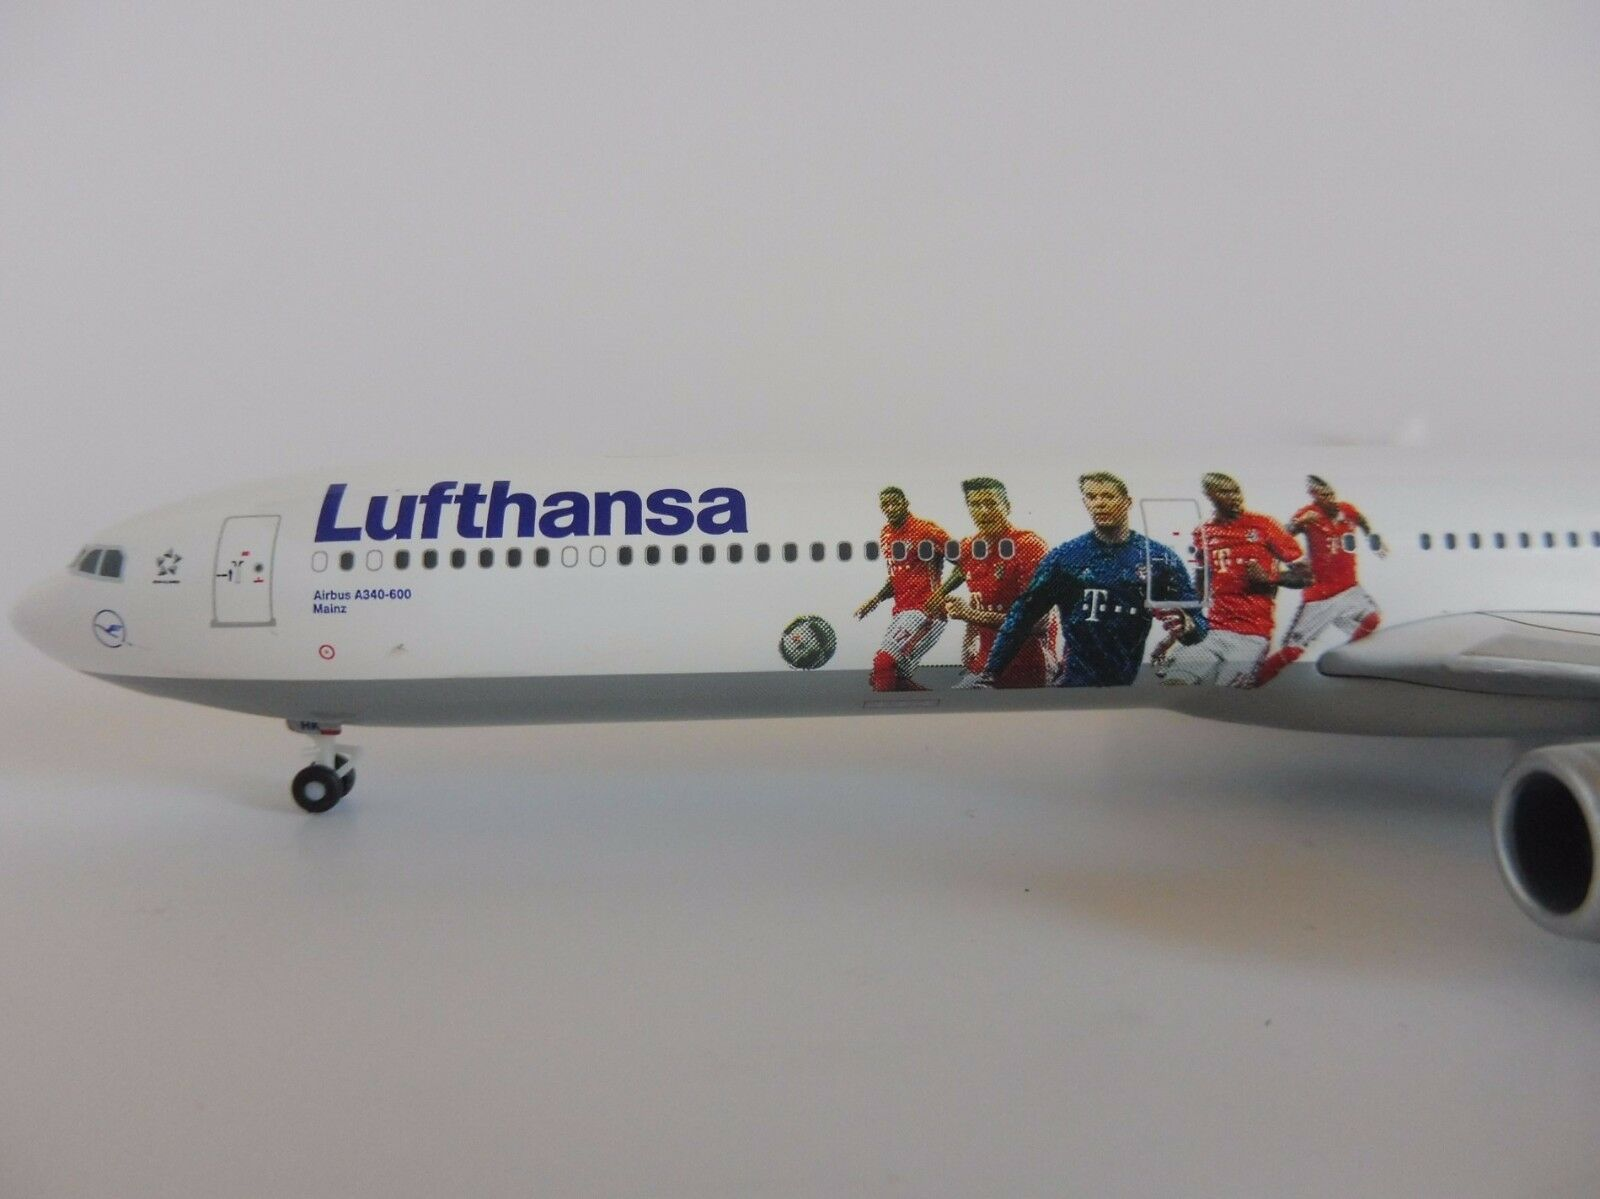 Lufthansa FC BAYERN MÜNCHEN Airbus A340-600 1 400 400 400 Herpa 562553 A340 Audi USA dbb8db